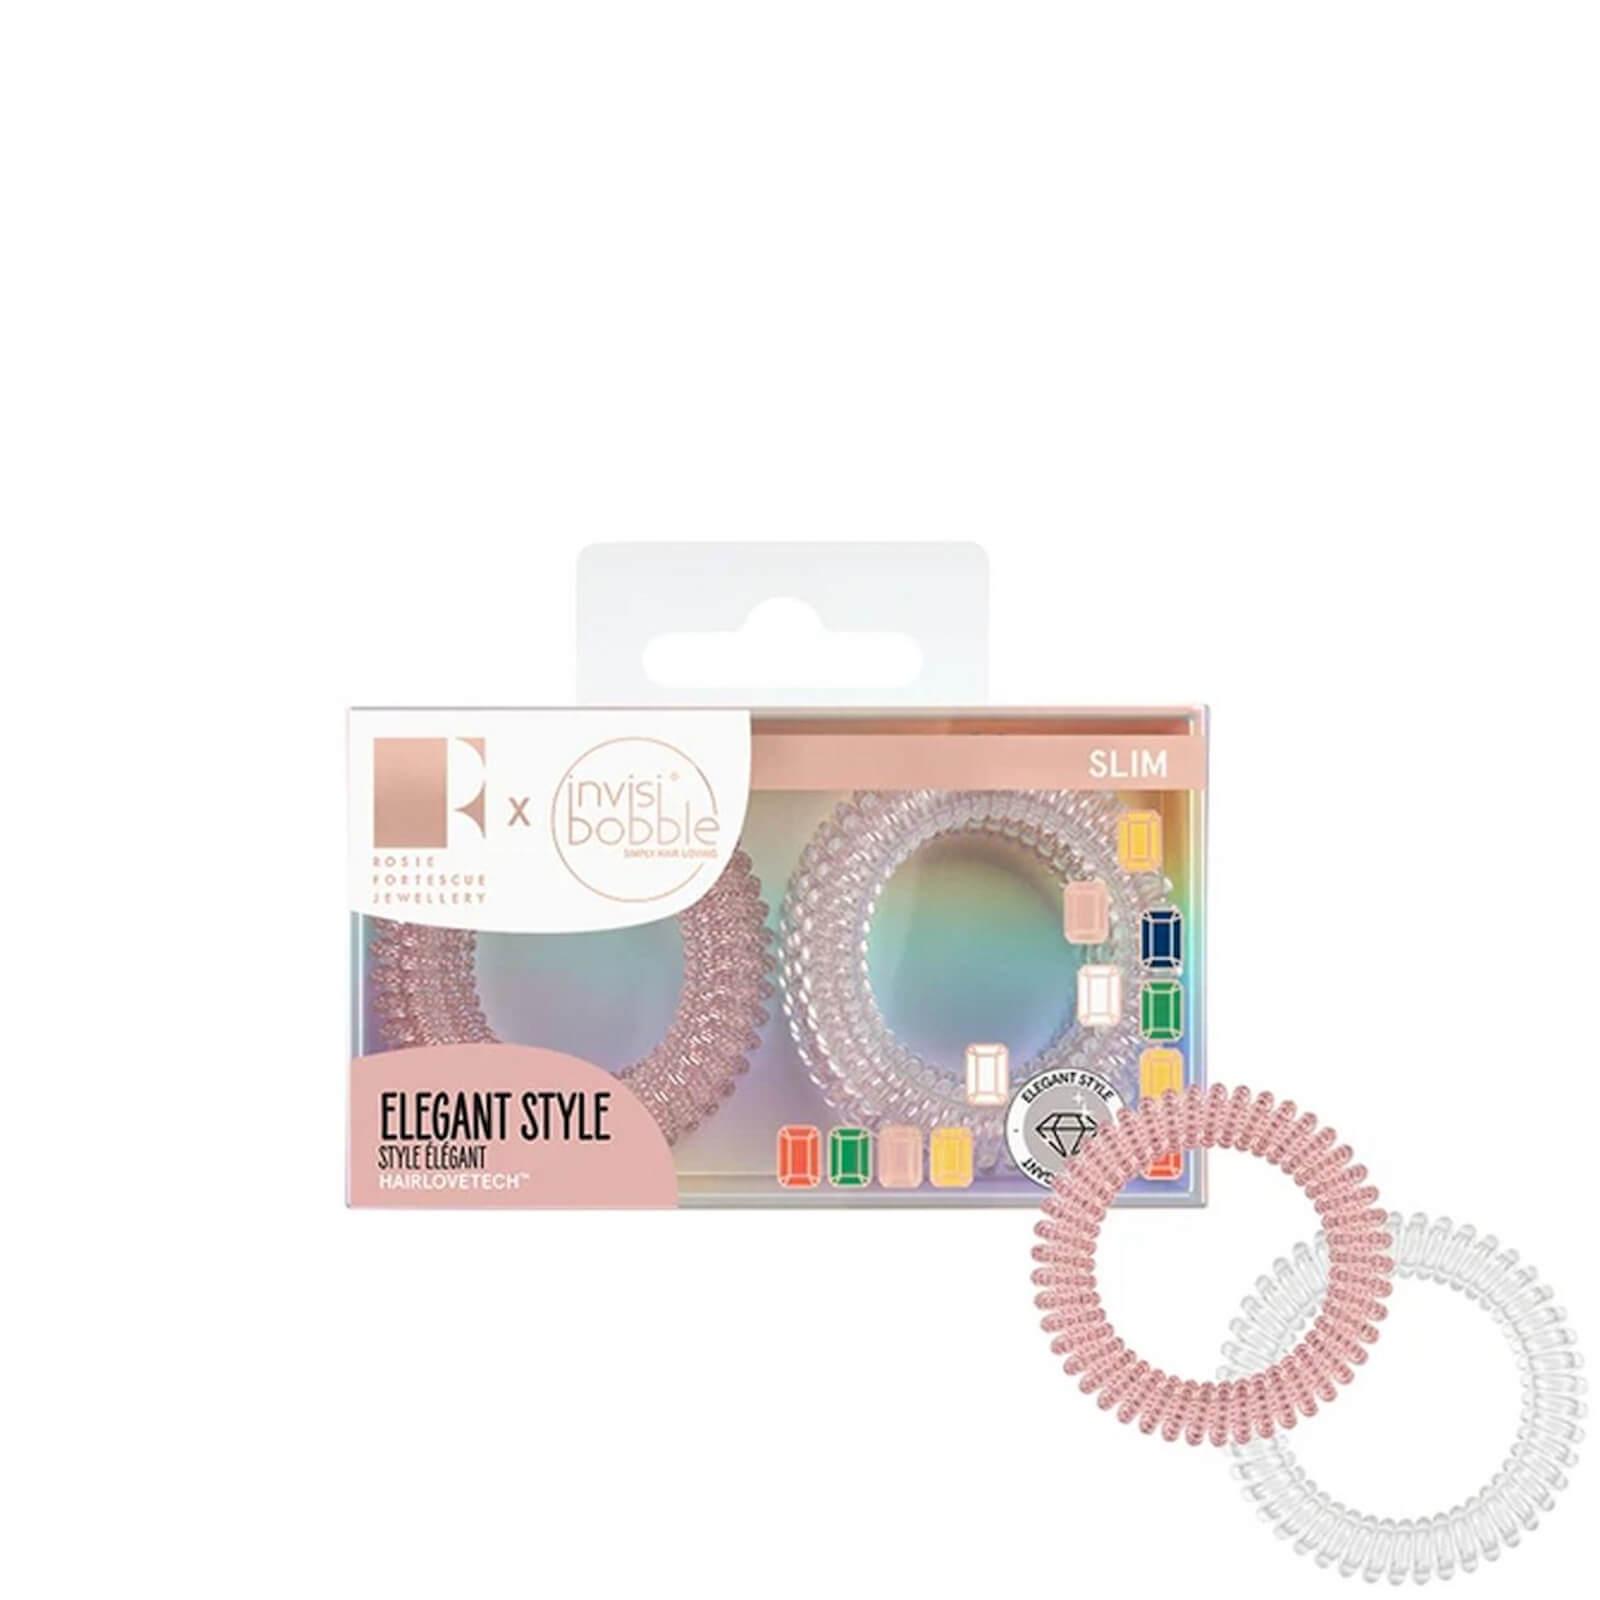 Купить Invisibobble SLIM - Розовые очки